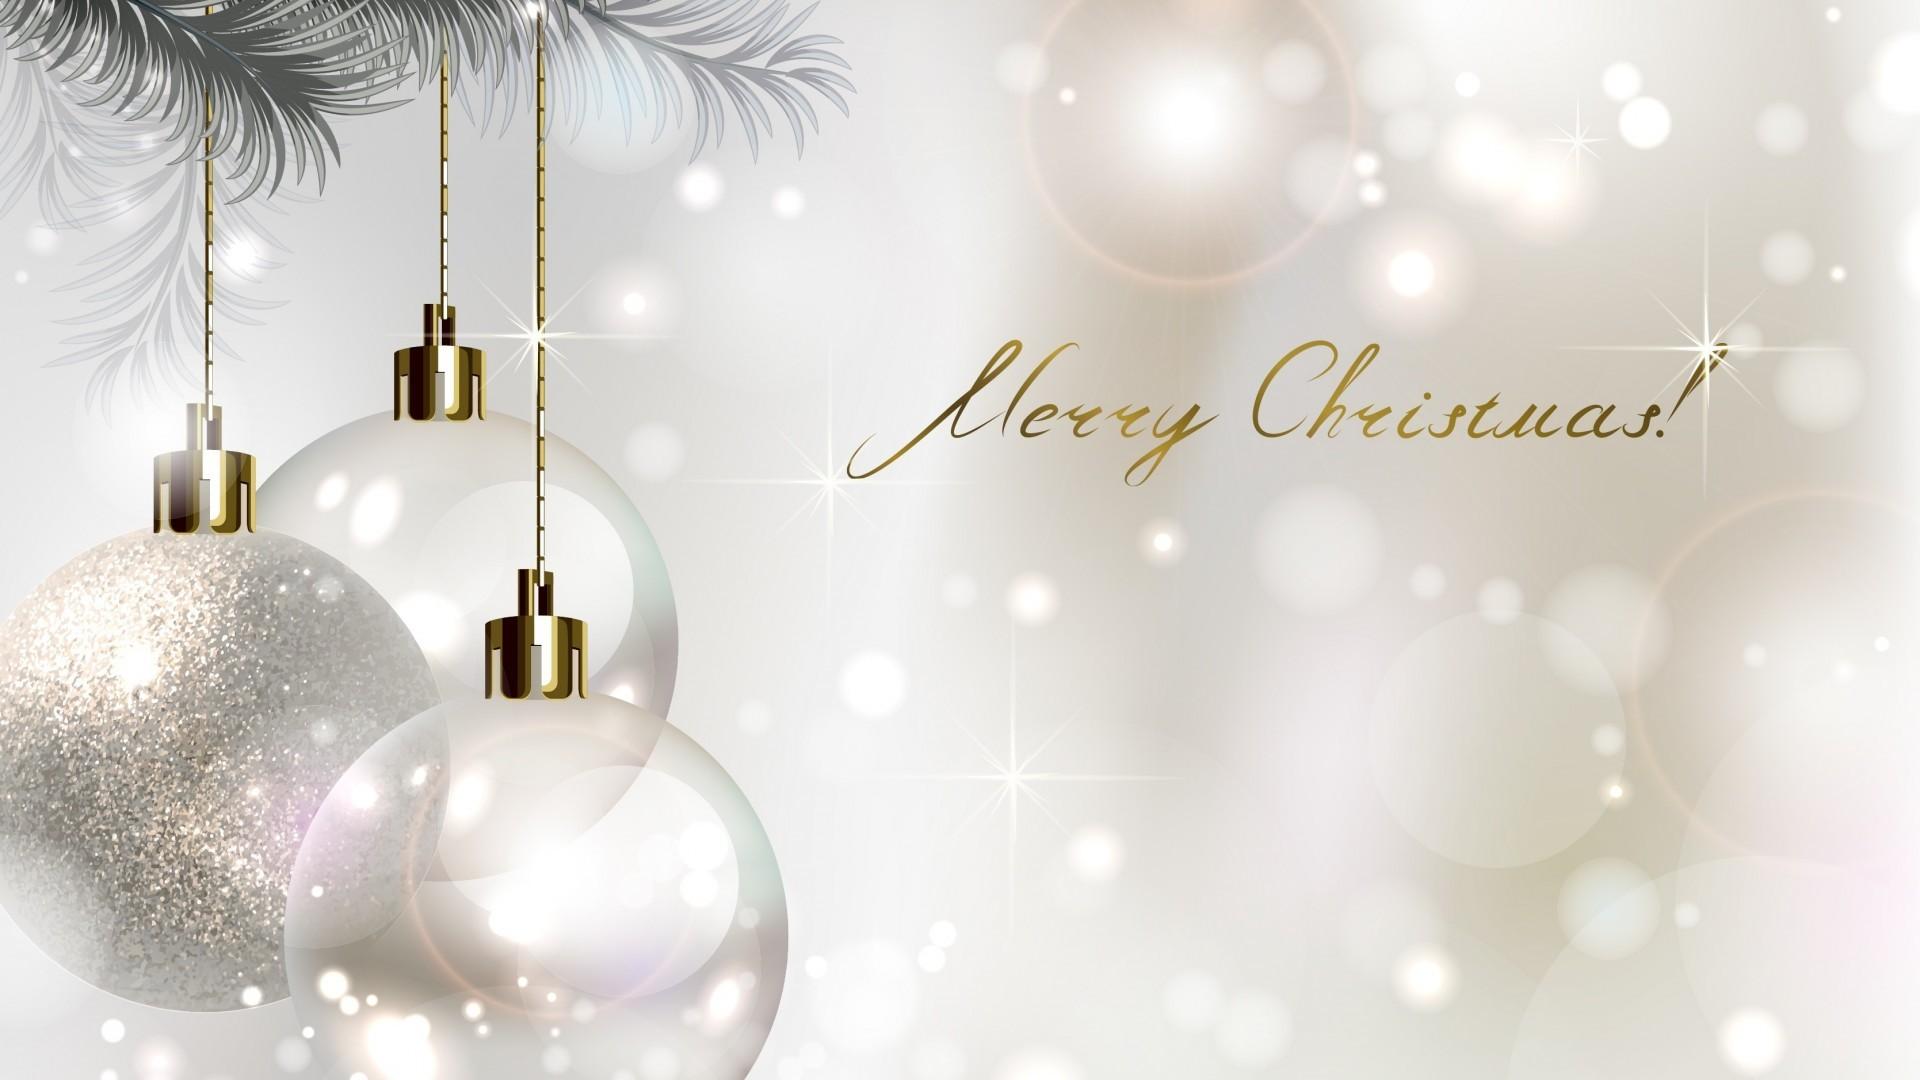 Res: 1920x1080, Christmas Wallpaper Full Hd